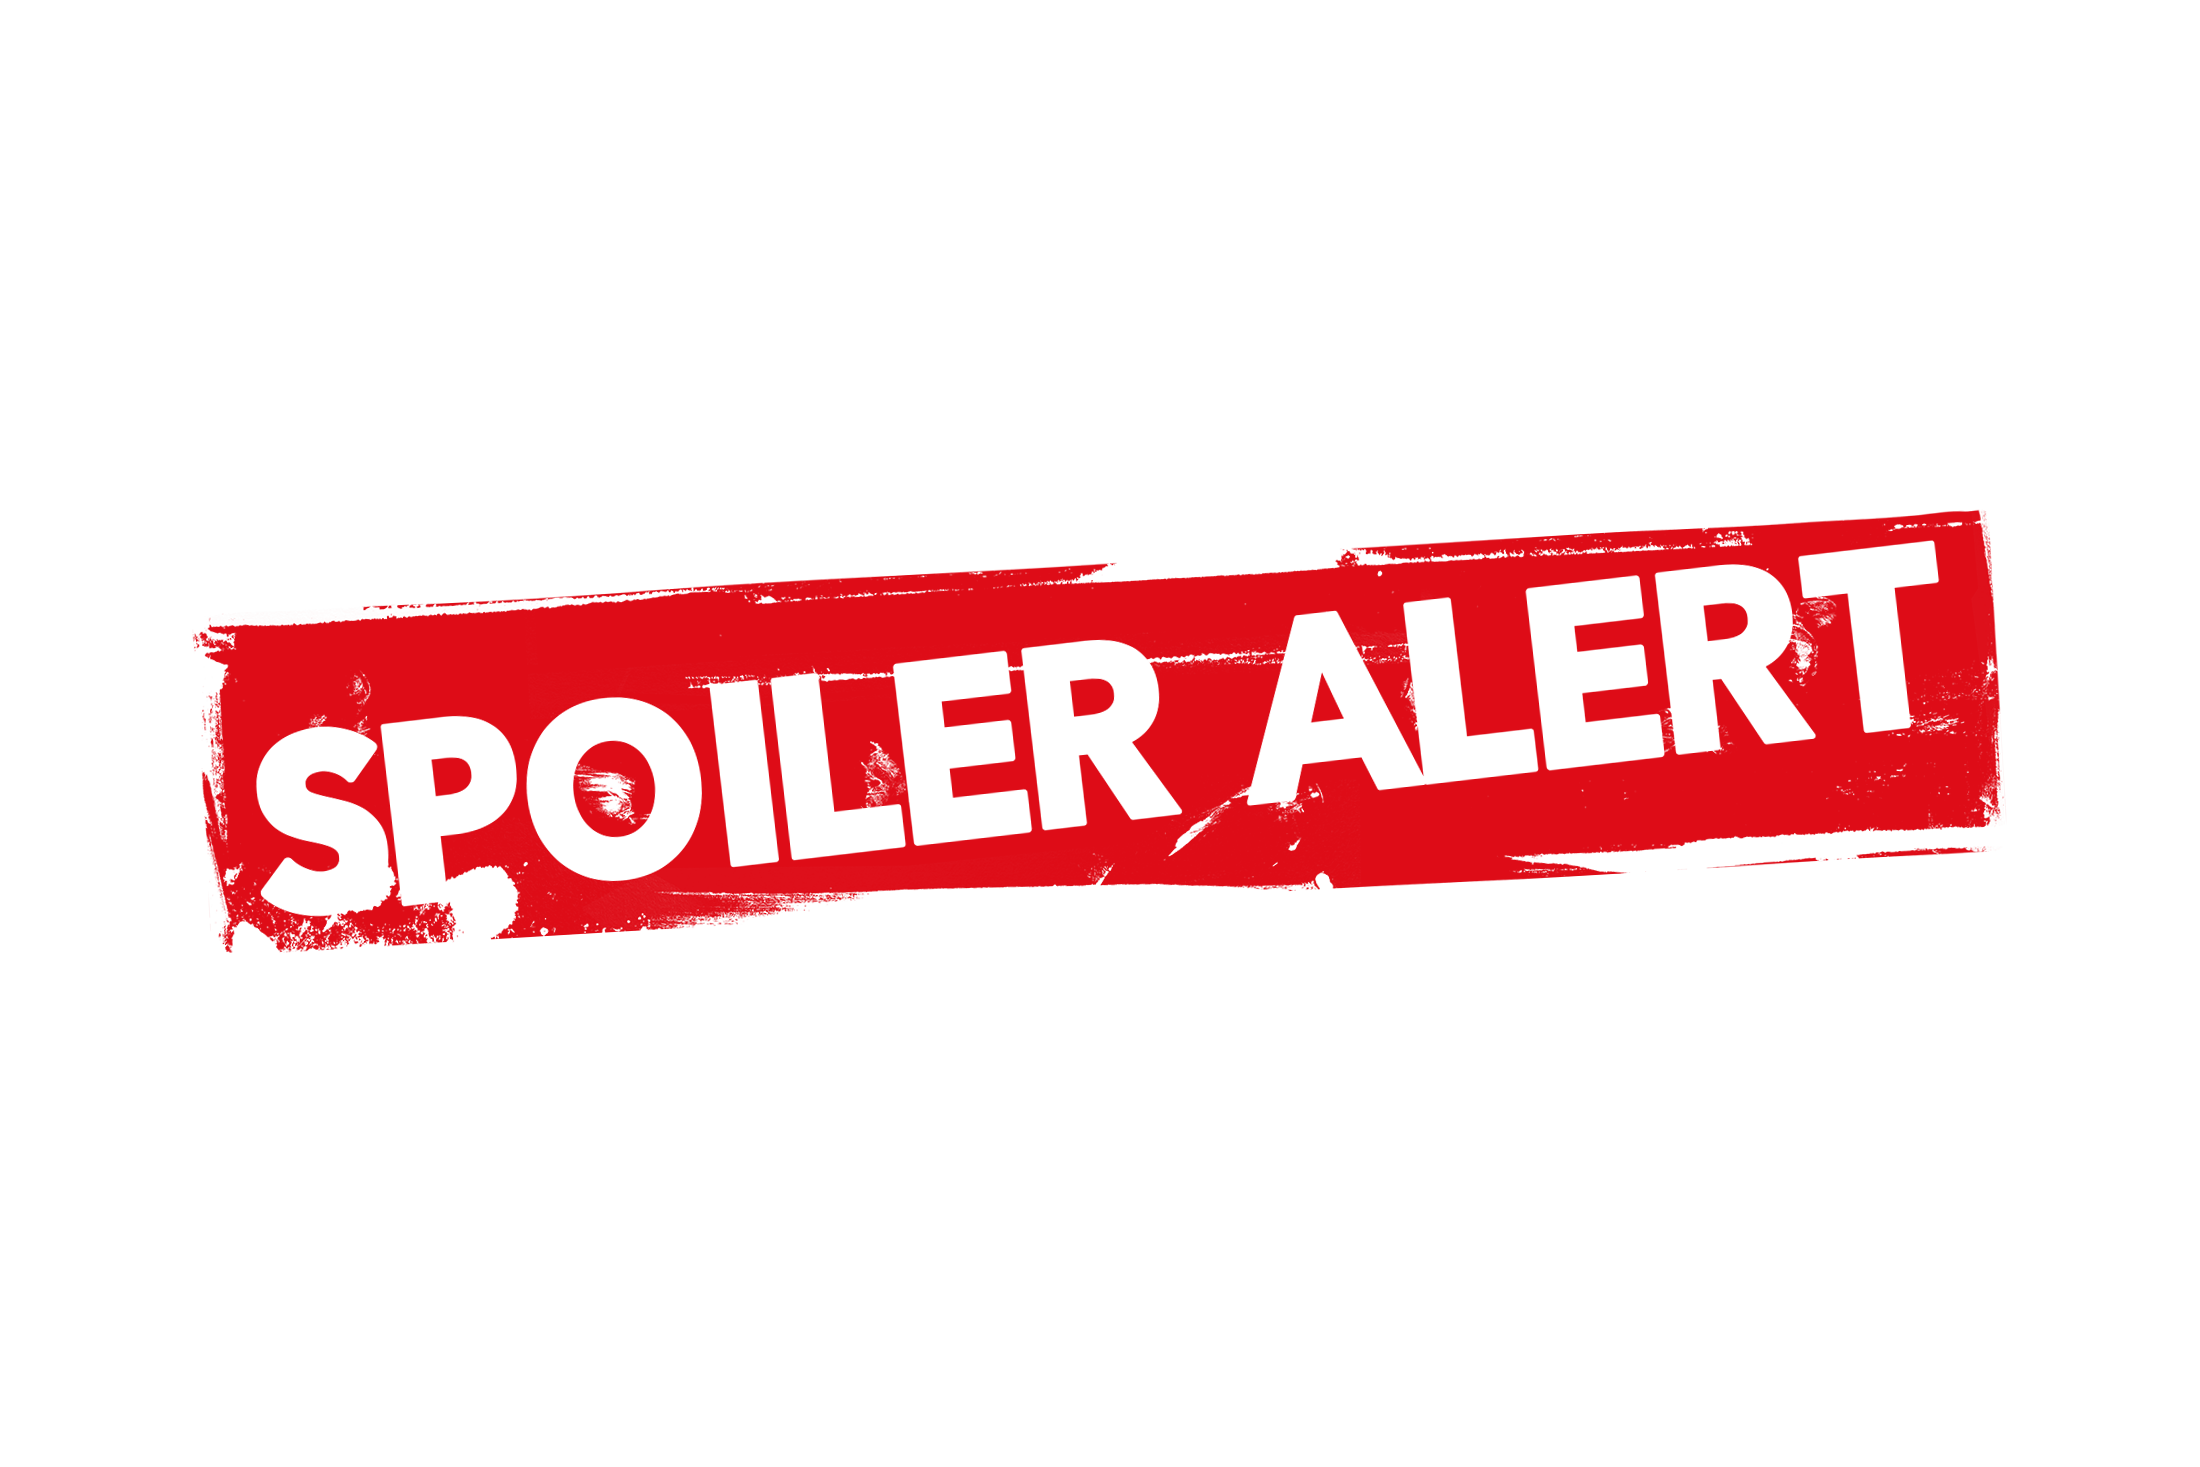 Grunge spoiler alert label PSD